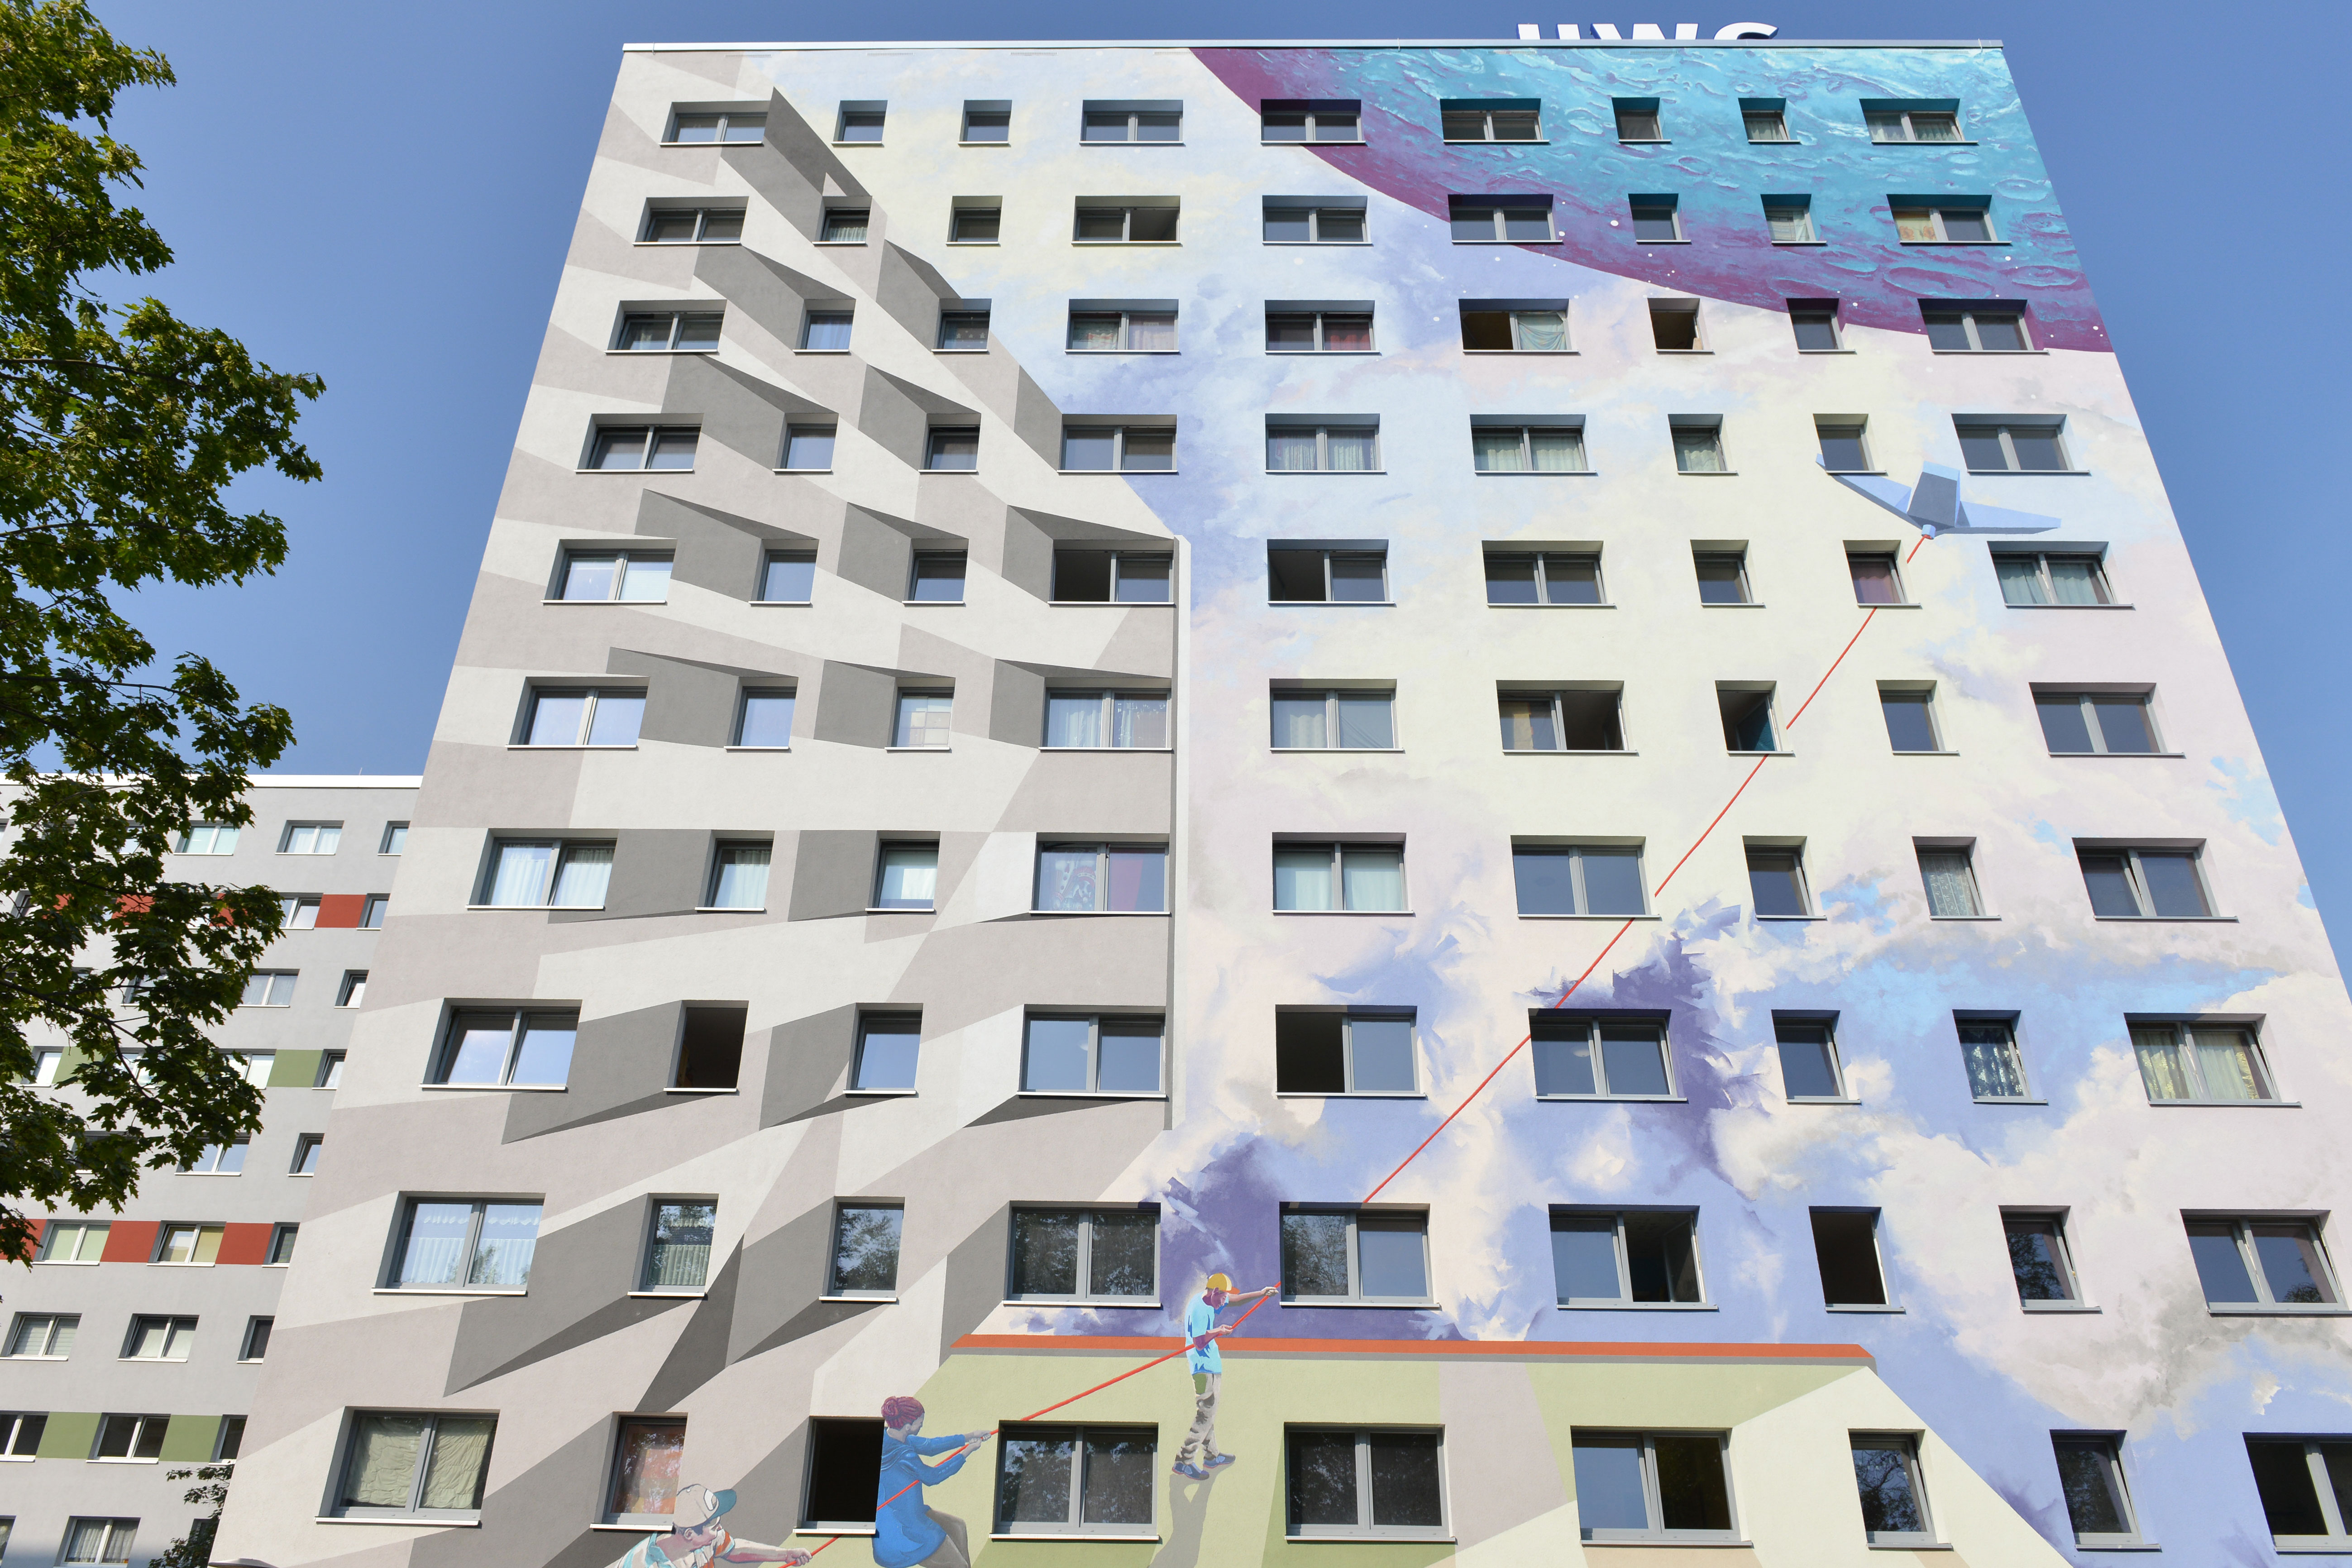 Fassadenkunst nah Vossstrasse